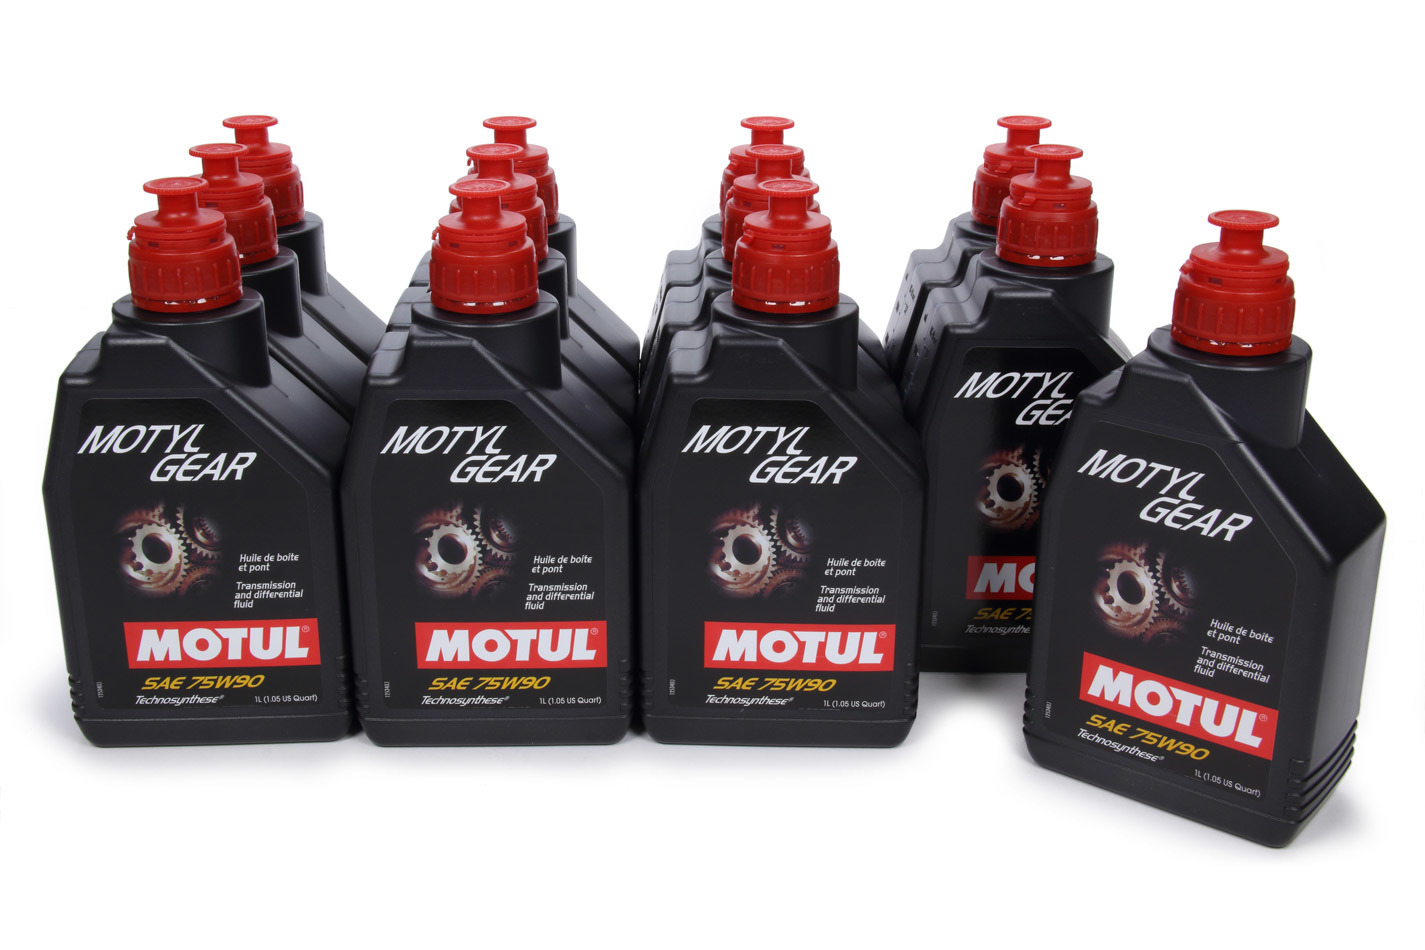 Motul Usa Motylgear 75w90 Case 12 x 1 Liter